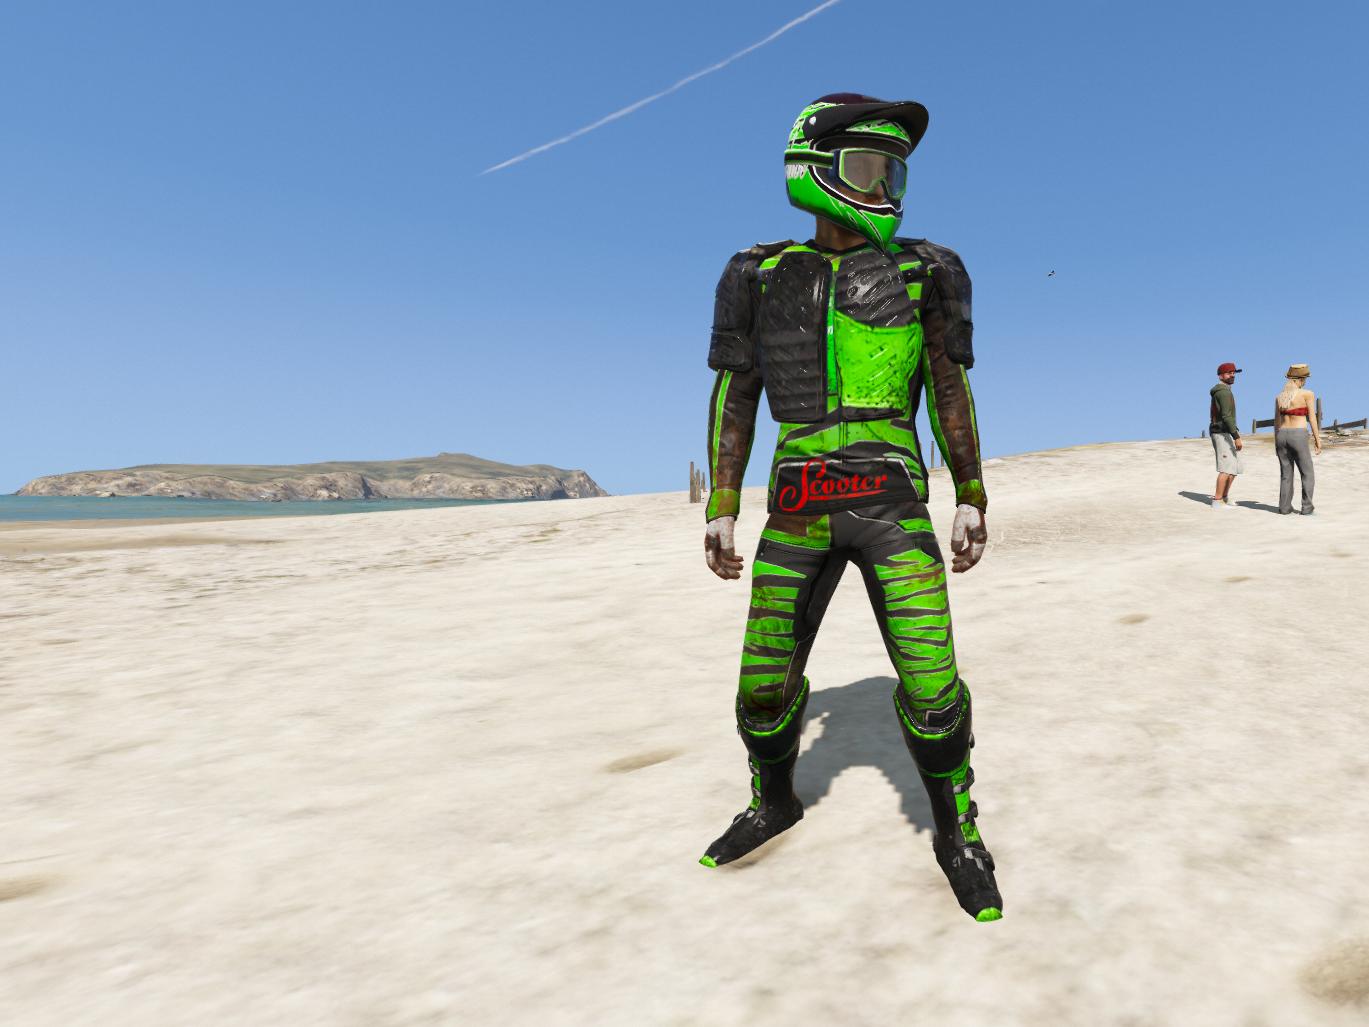 Motocross Biker Outfit Menyoo Gta5 Mods Com